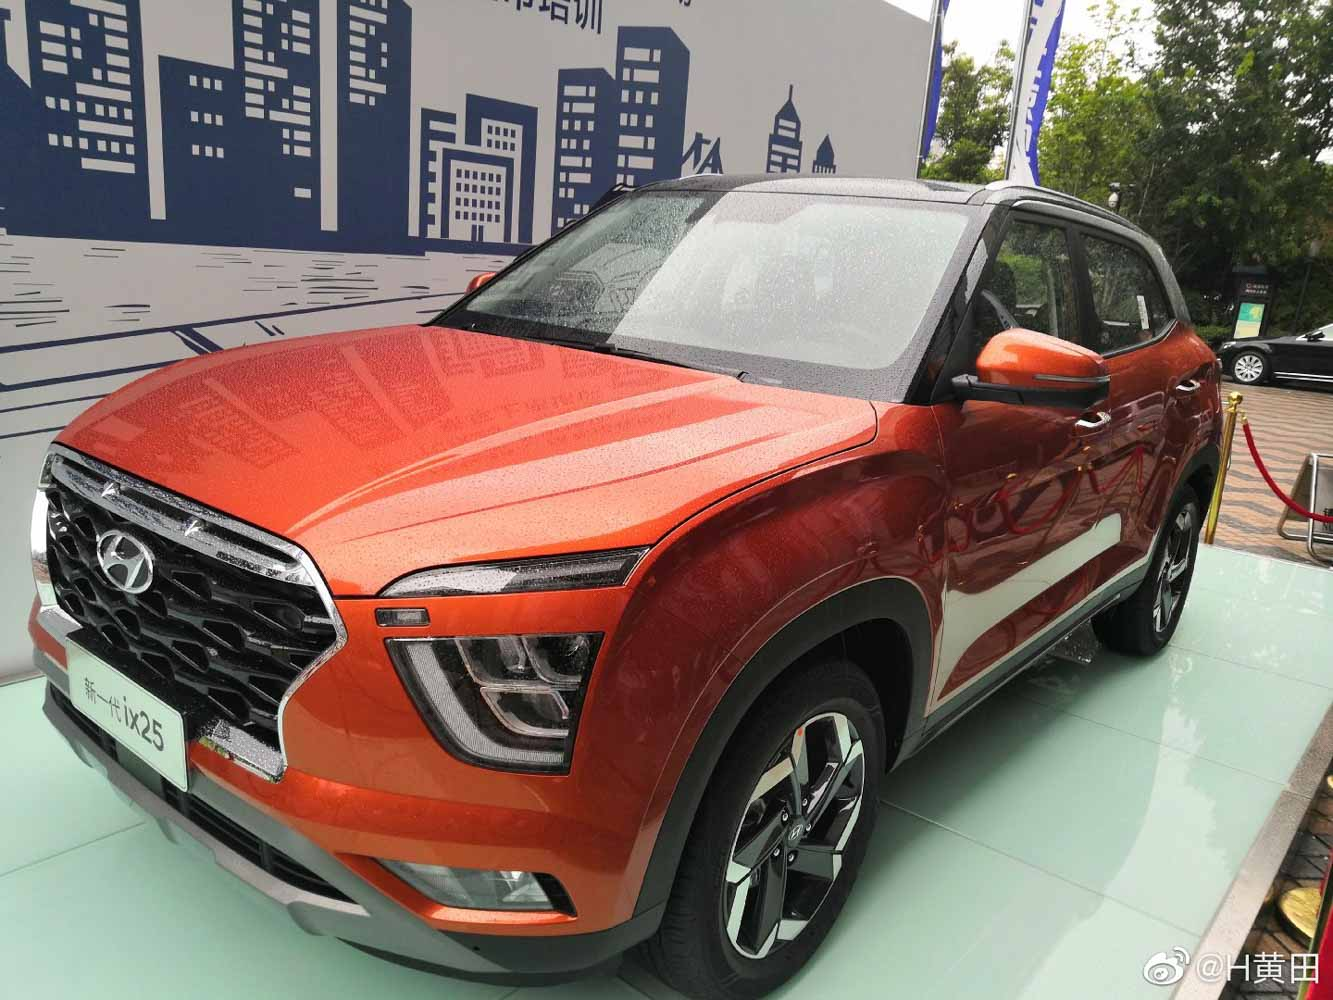 New 2020 Hyundai Creta Ix25 Seen Inside Out Clear Pics